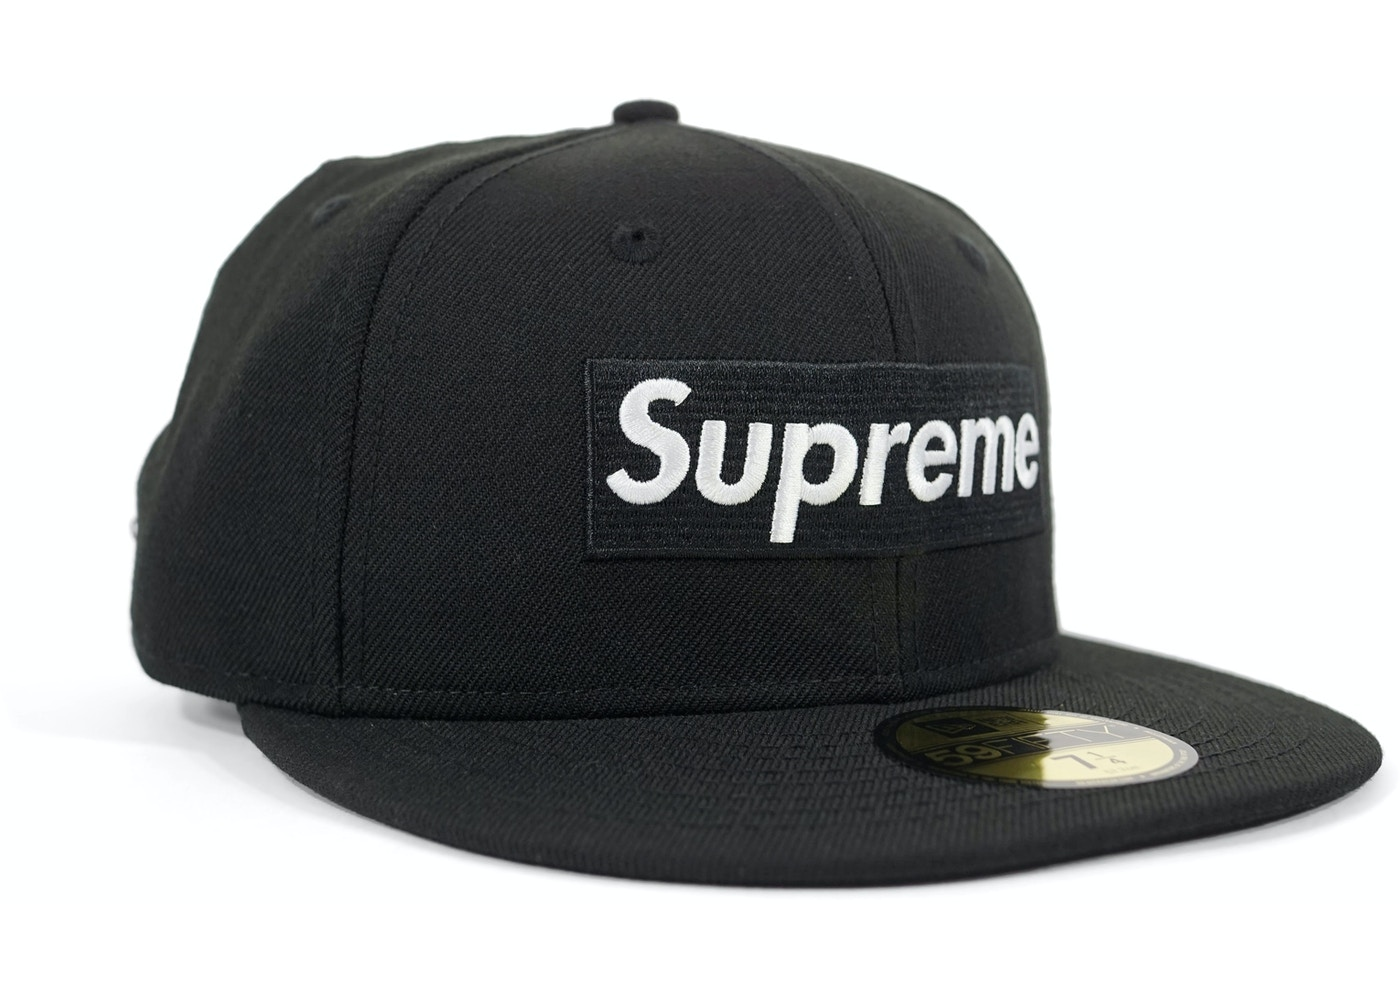 a6a89d17f78 Streetwear - Supreme Headwear - Highest Bid